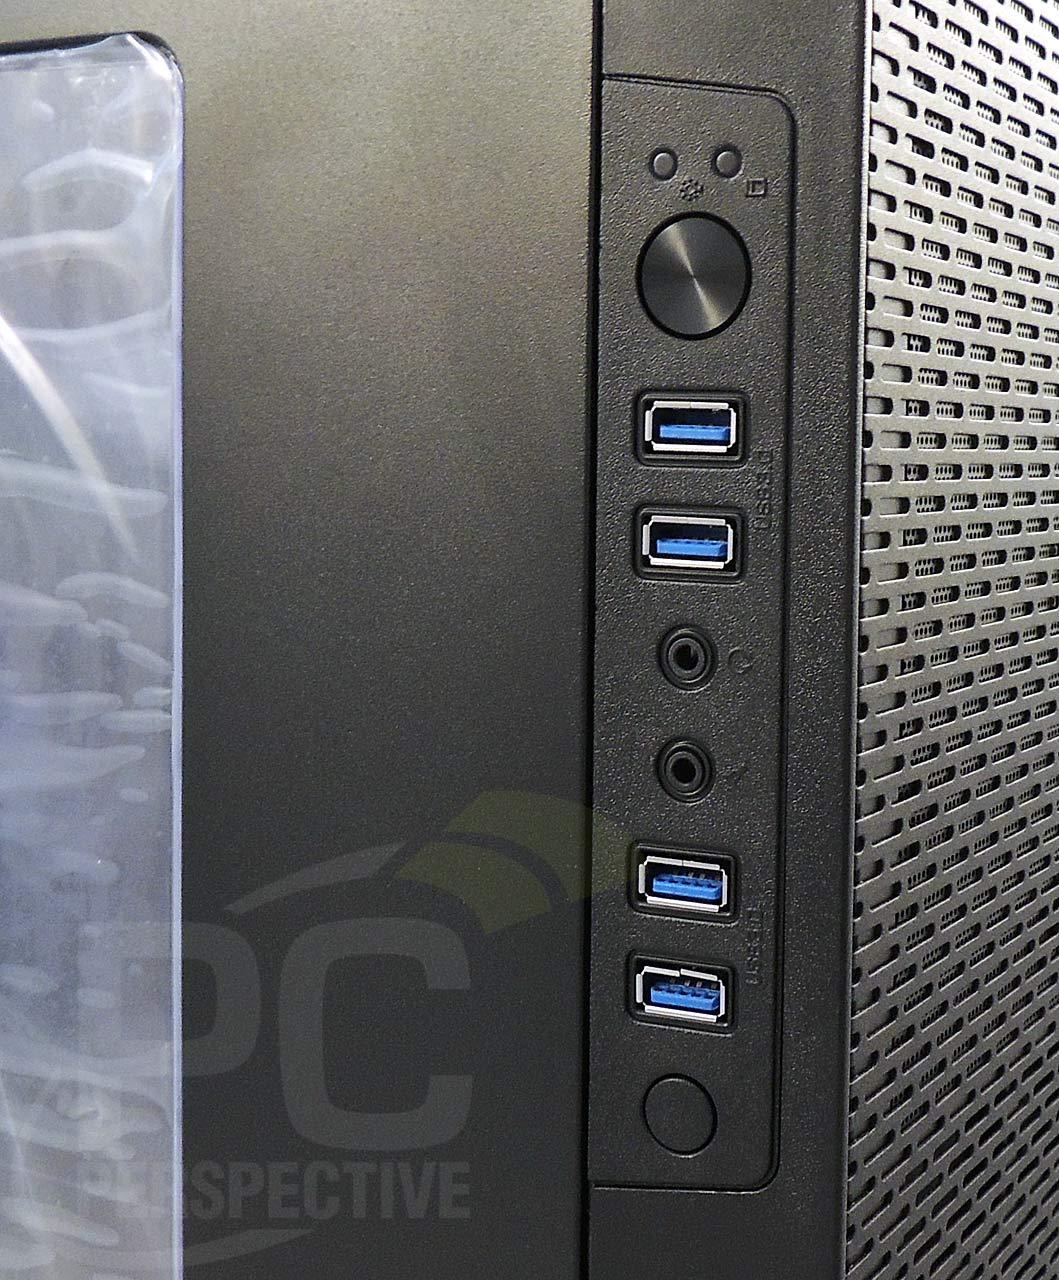 a8-case-control-panel-closeup-0.jpg